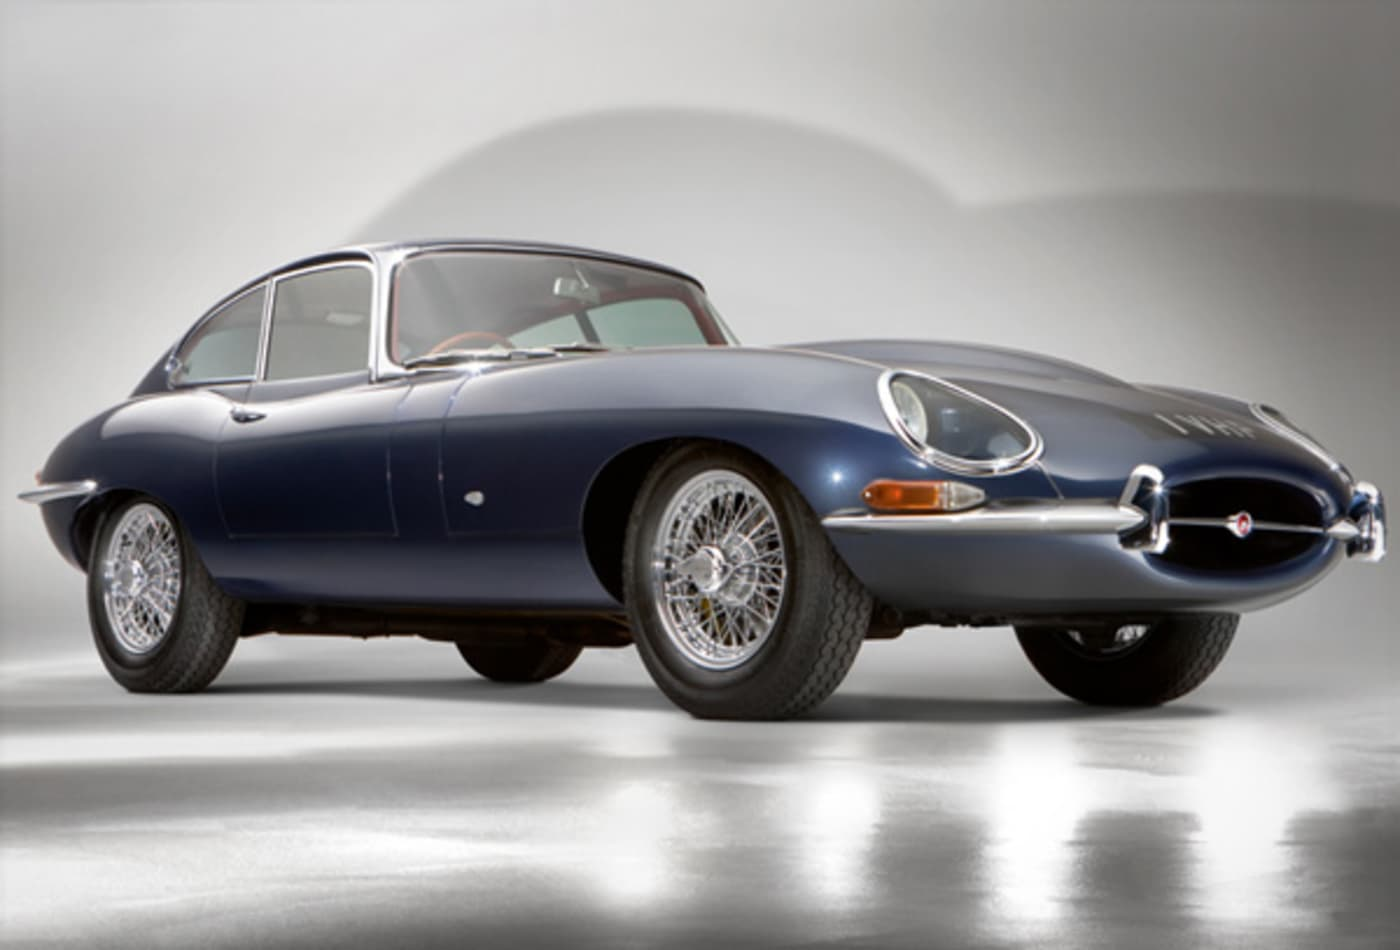 48705395 Jaguar-E-Type-Top-10-Best-Looking-Cars-All-Time-CNBC.jpg